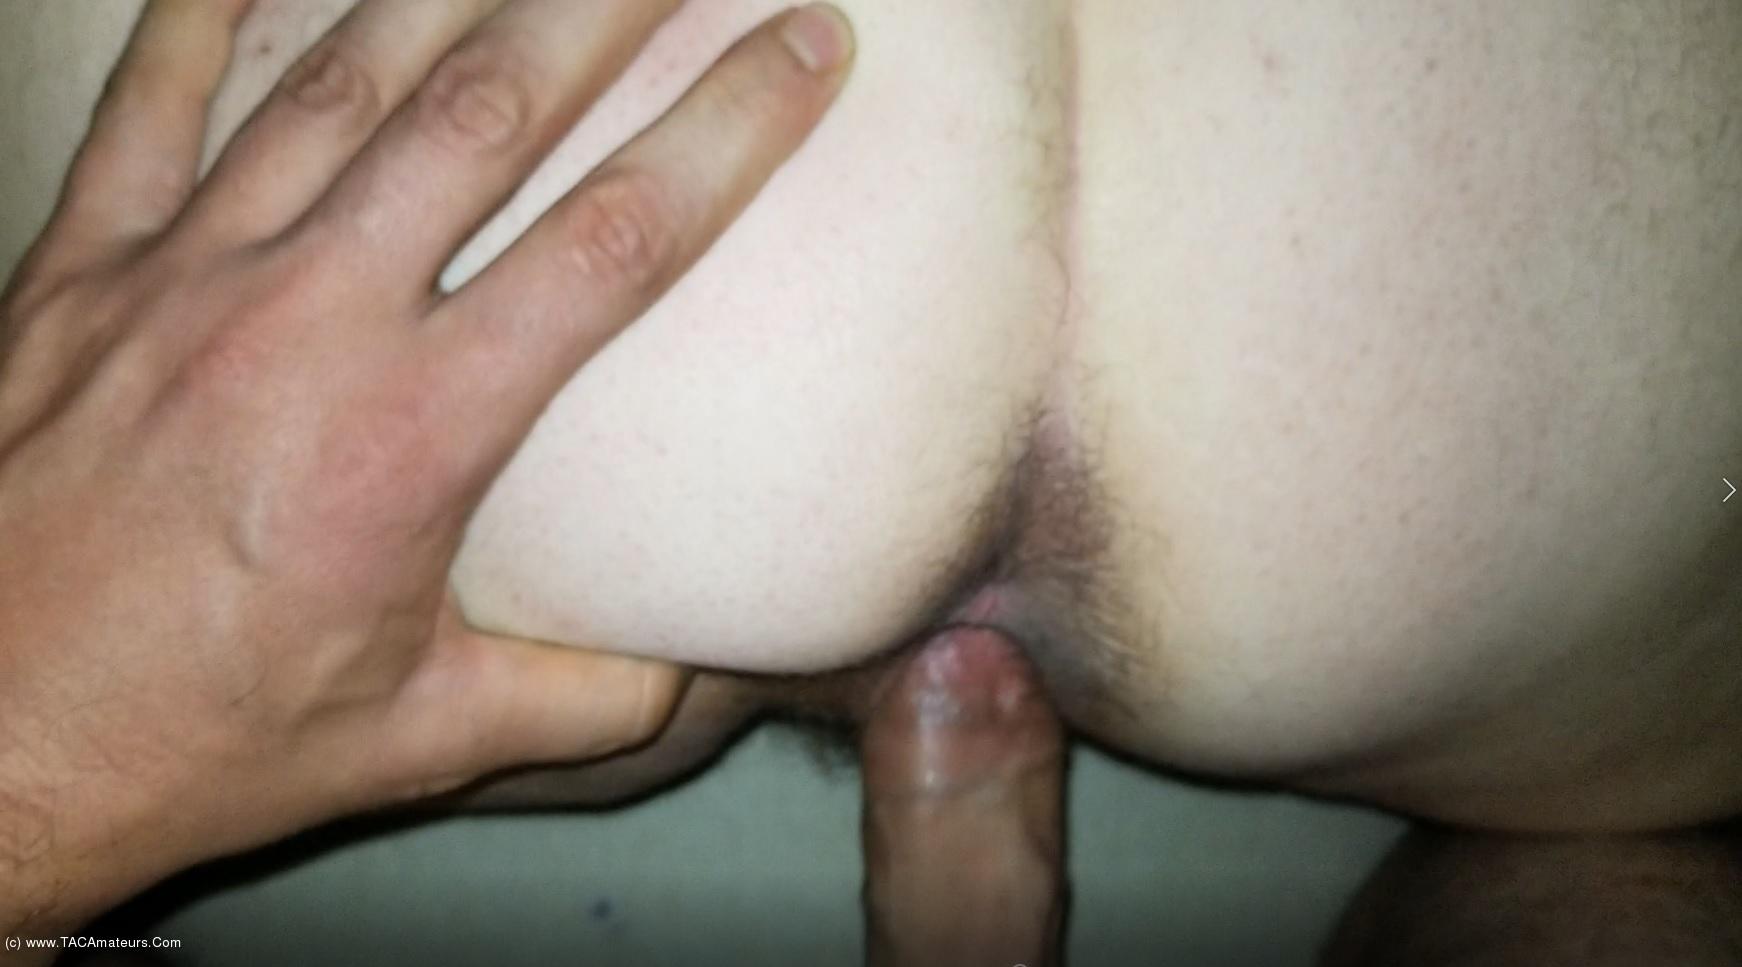 SexyNEBBW - SexyNEBBW Fucks Her Husband Pt2 scene 0